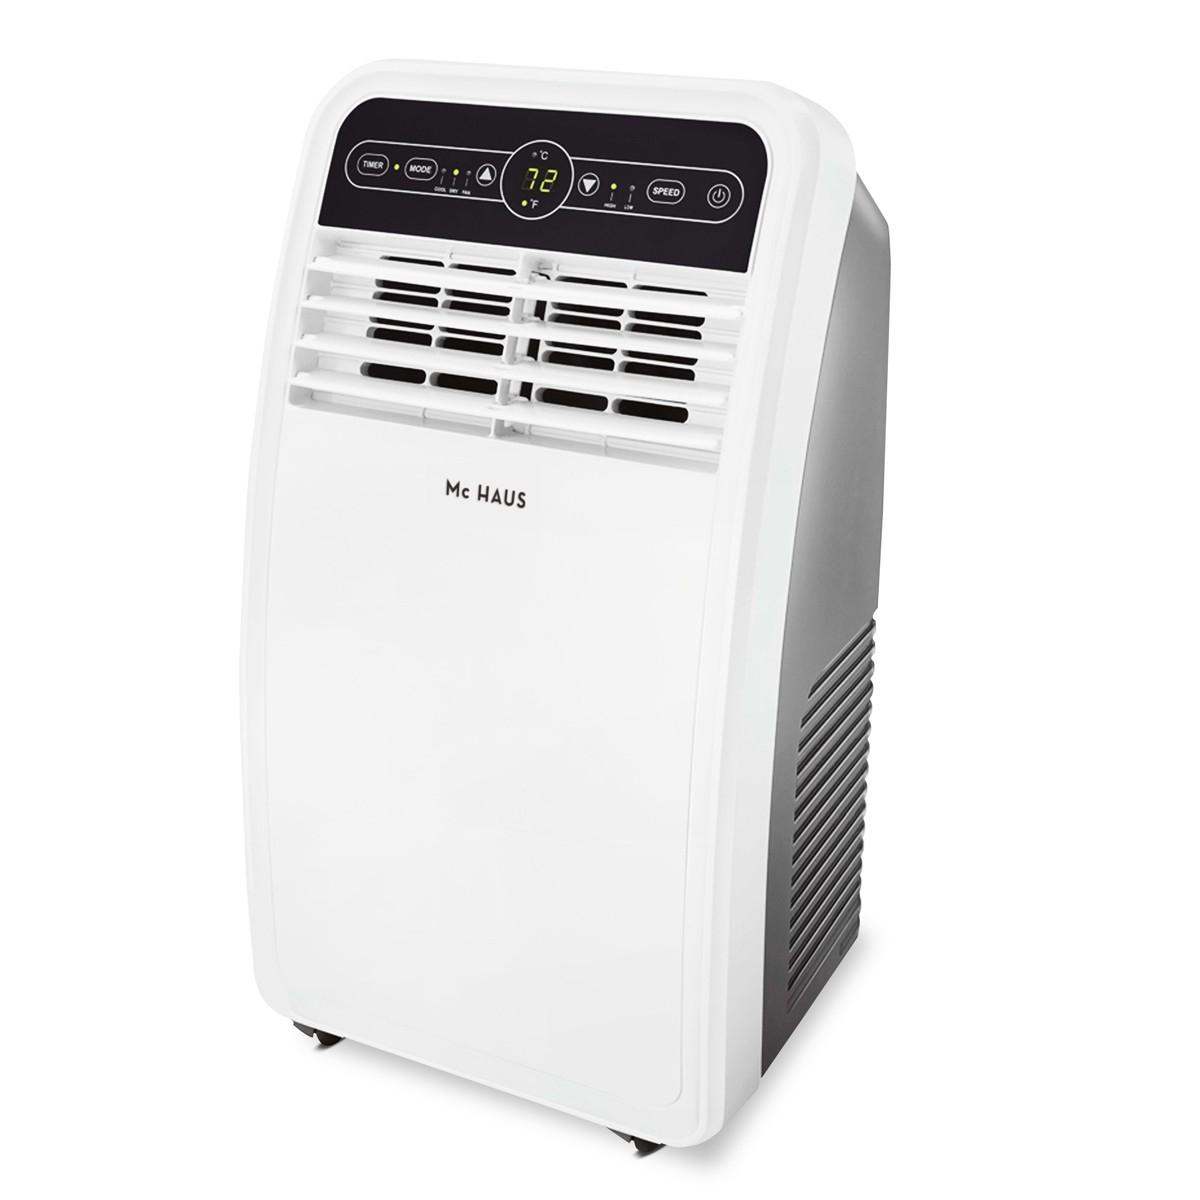 Aire acondicionado portatil silencioso 7000BTU 20m2 ARTIC-12